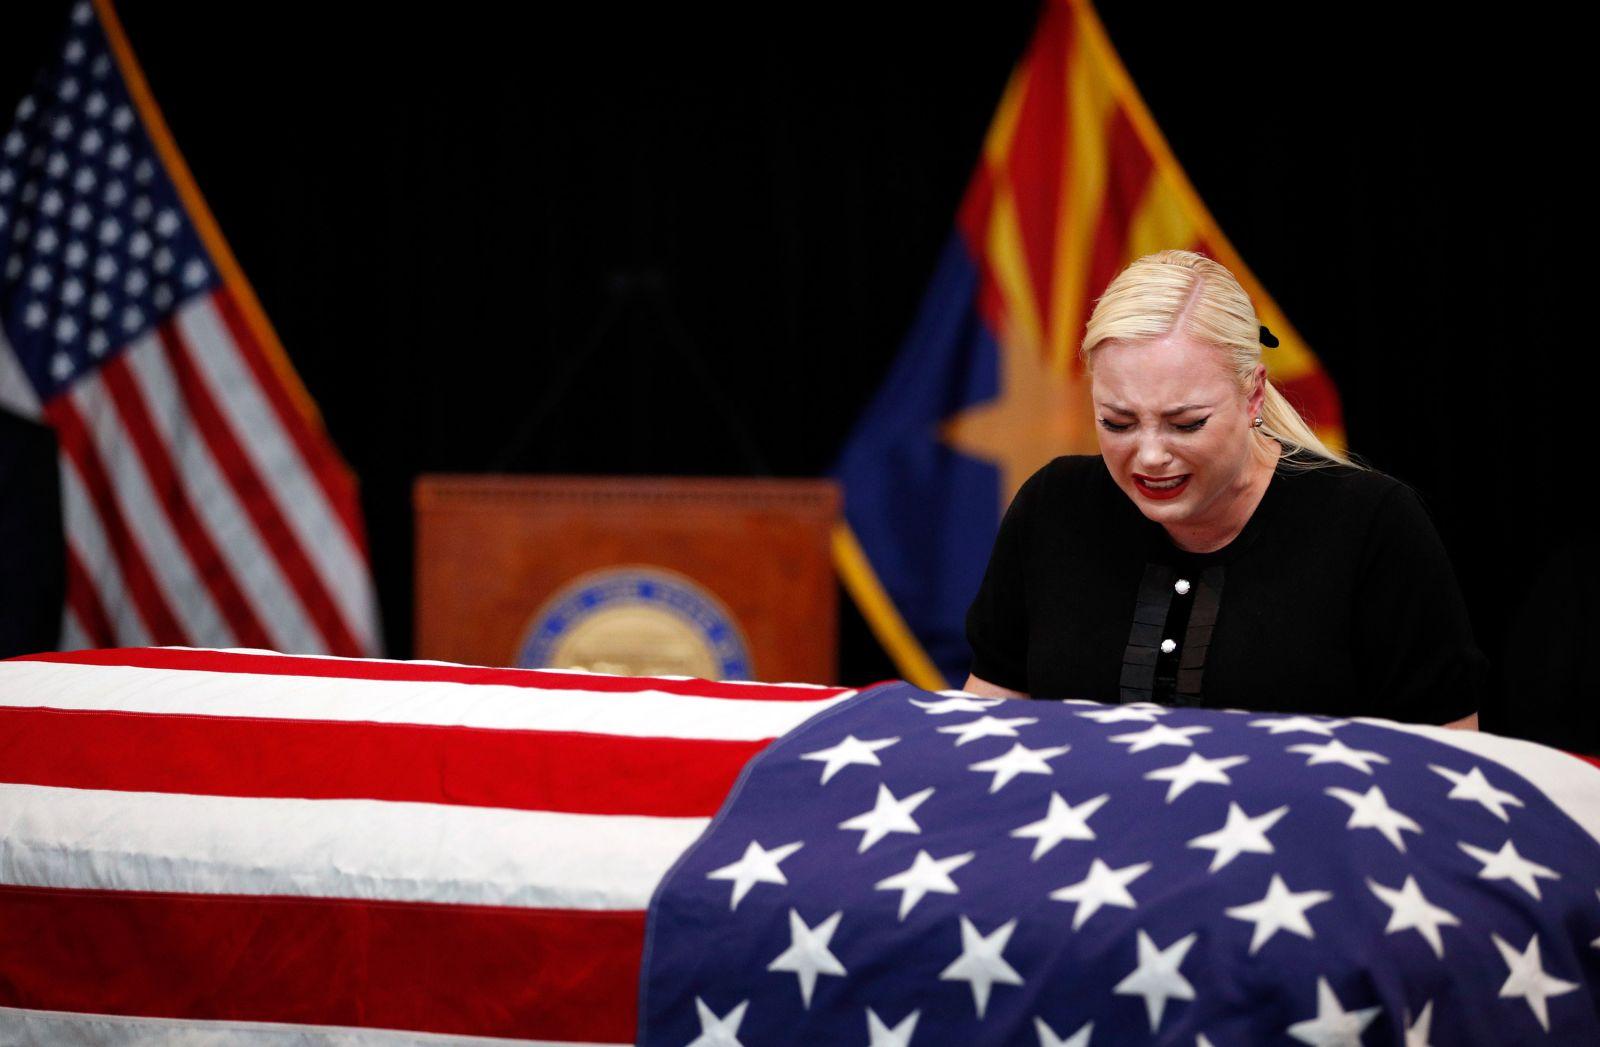 Meghan McCain, daughter of Sen. John McCain, cries at the casket of her father.